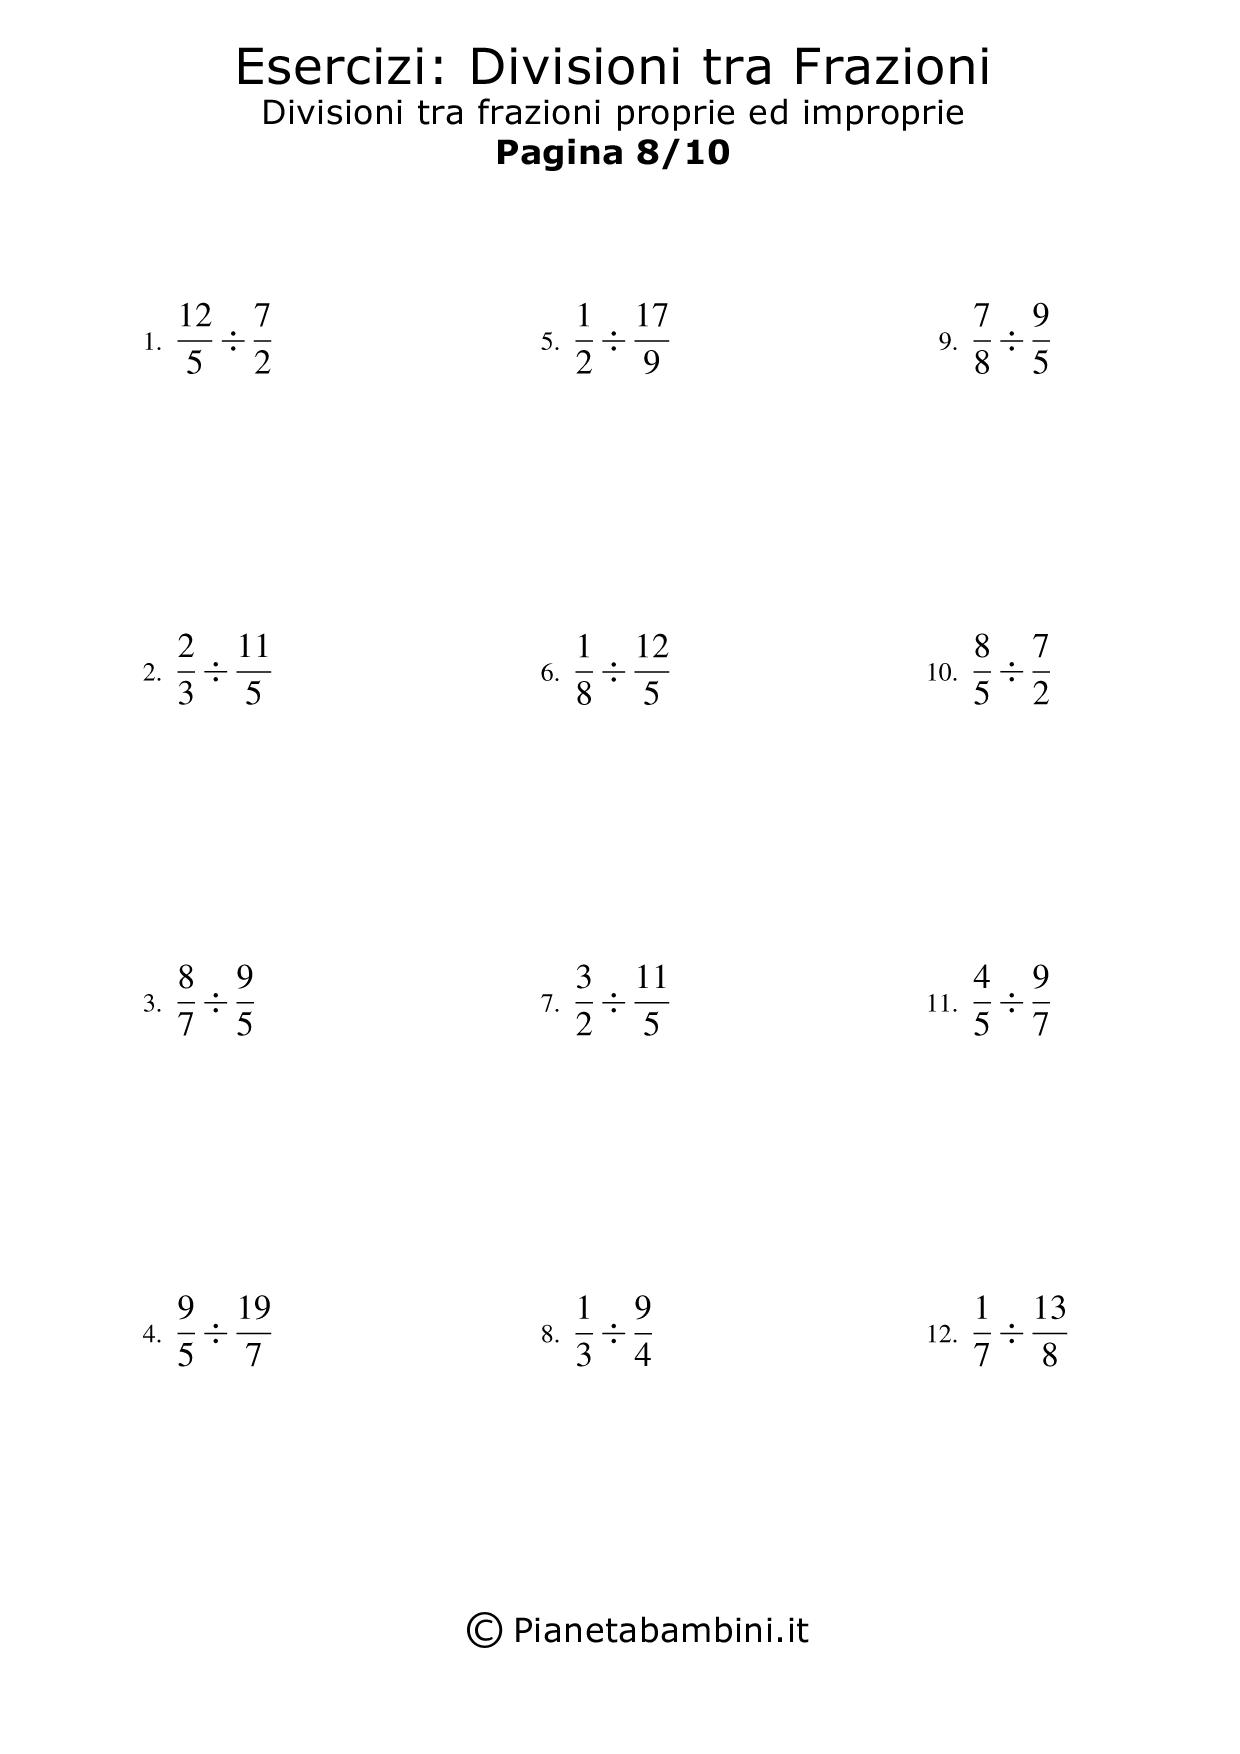 Esercizi-Divisioni-Frazioni-Proprie-Improprie_08